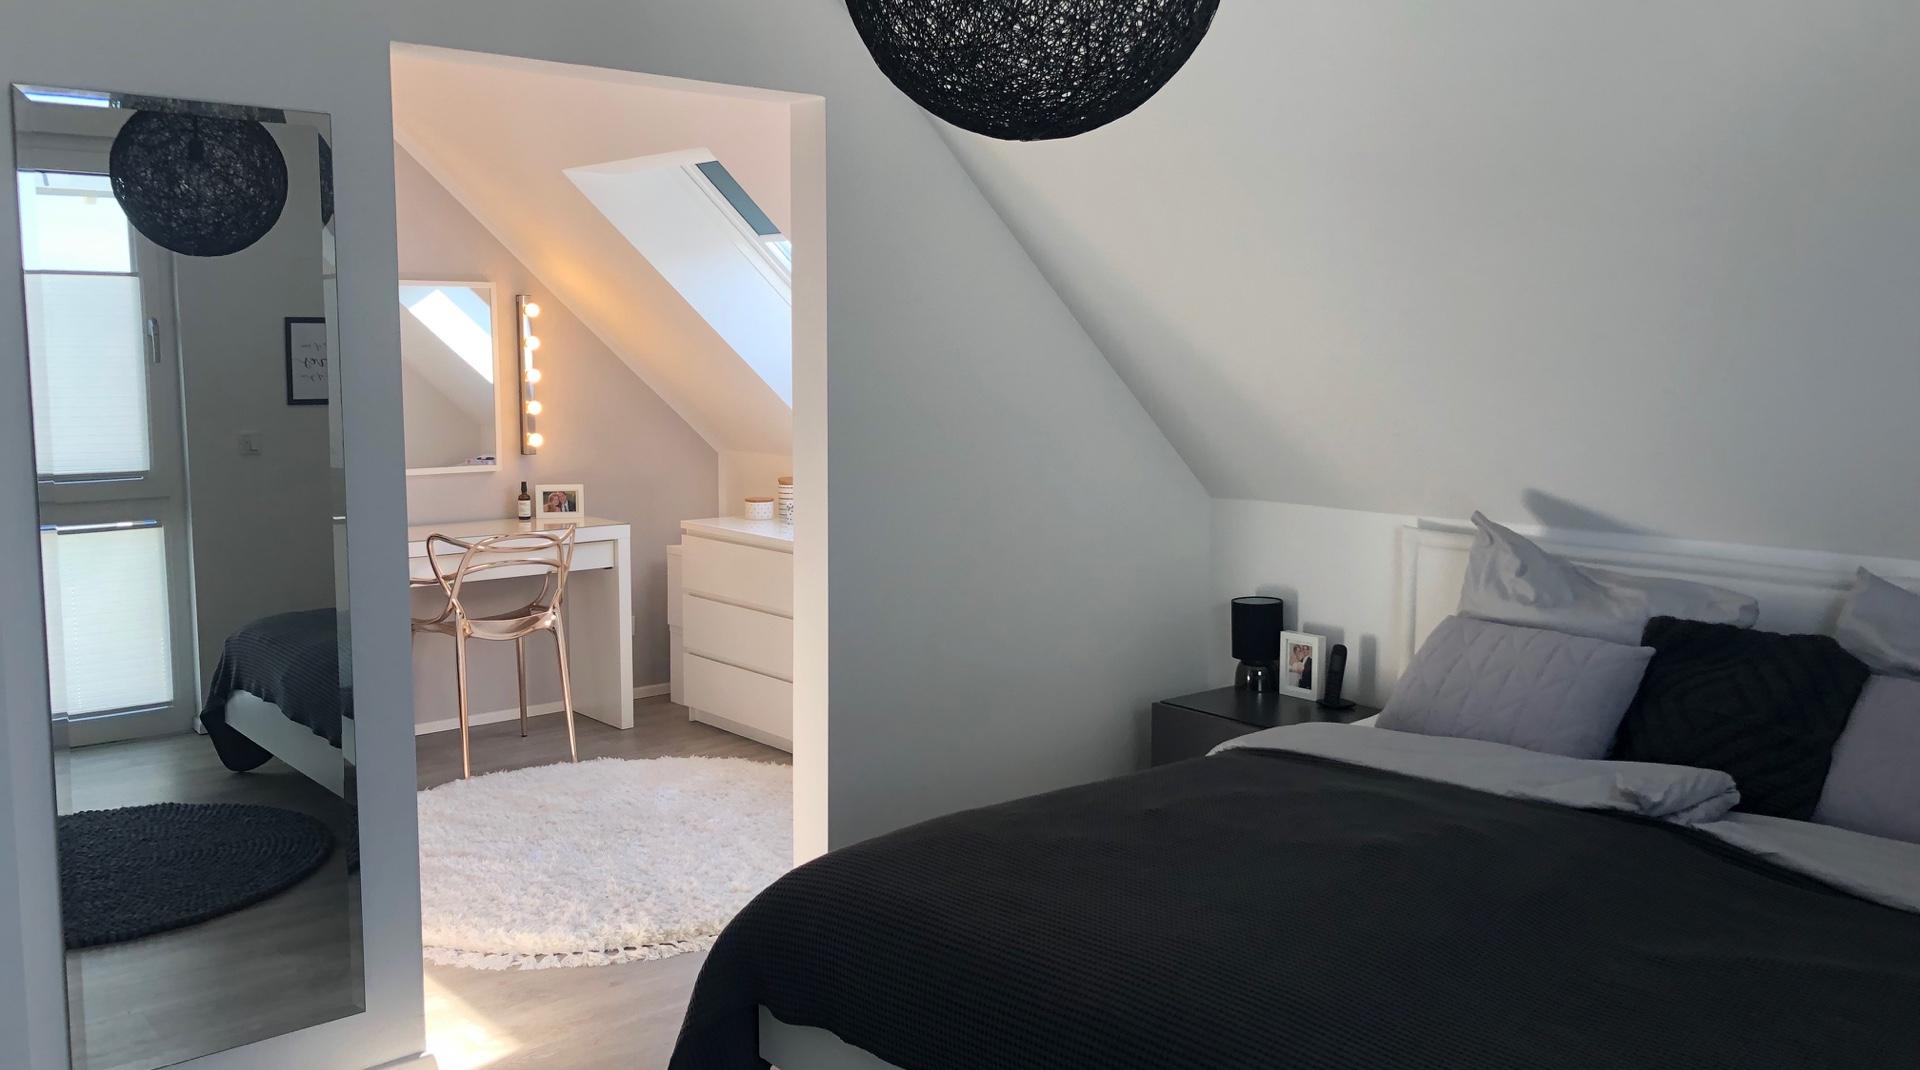 Dachstory fox.living: Das Schlafzimmer